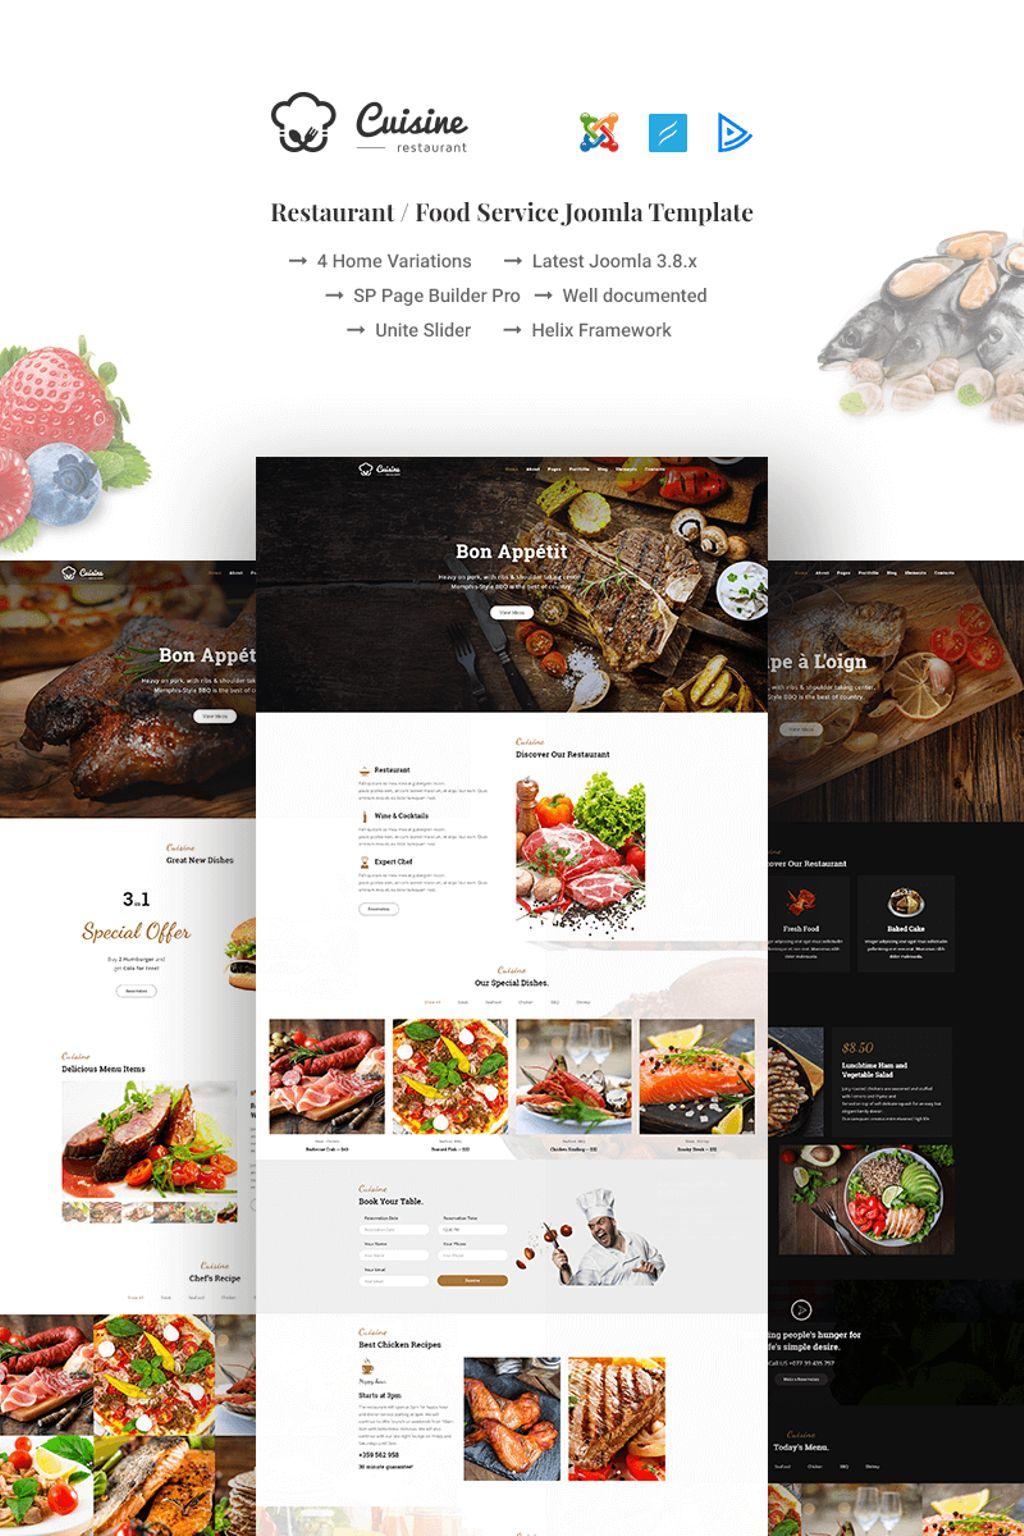 Cuisine - Restaurant / Food Service Template Joomla №66965